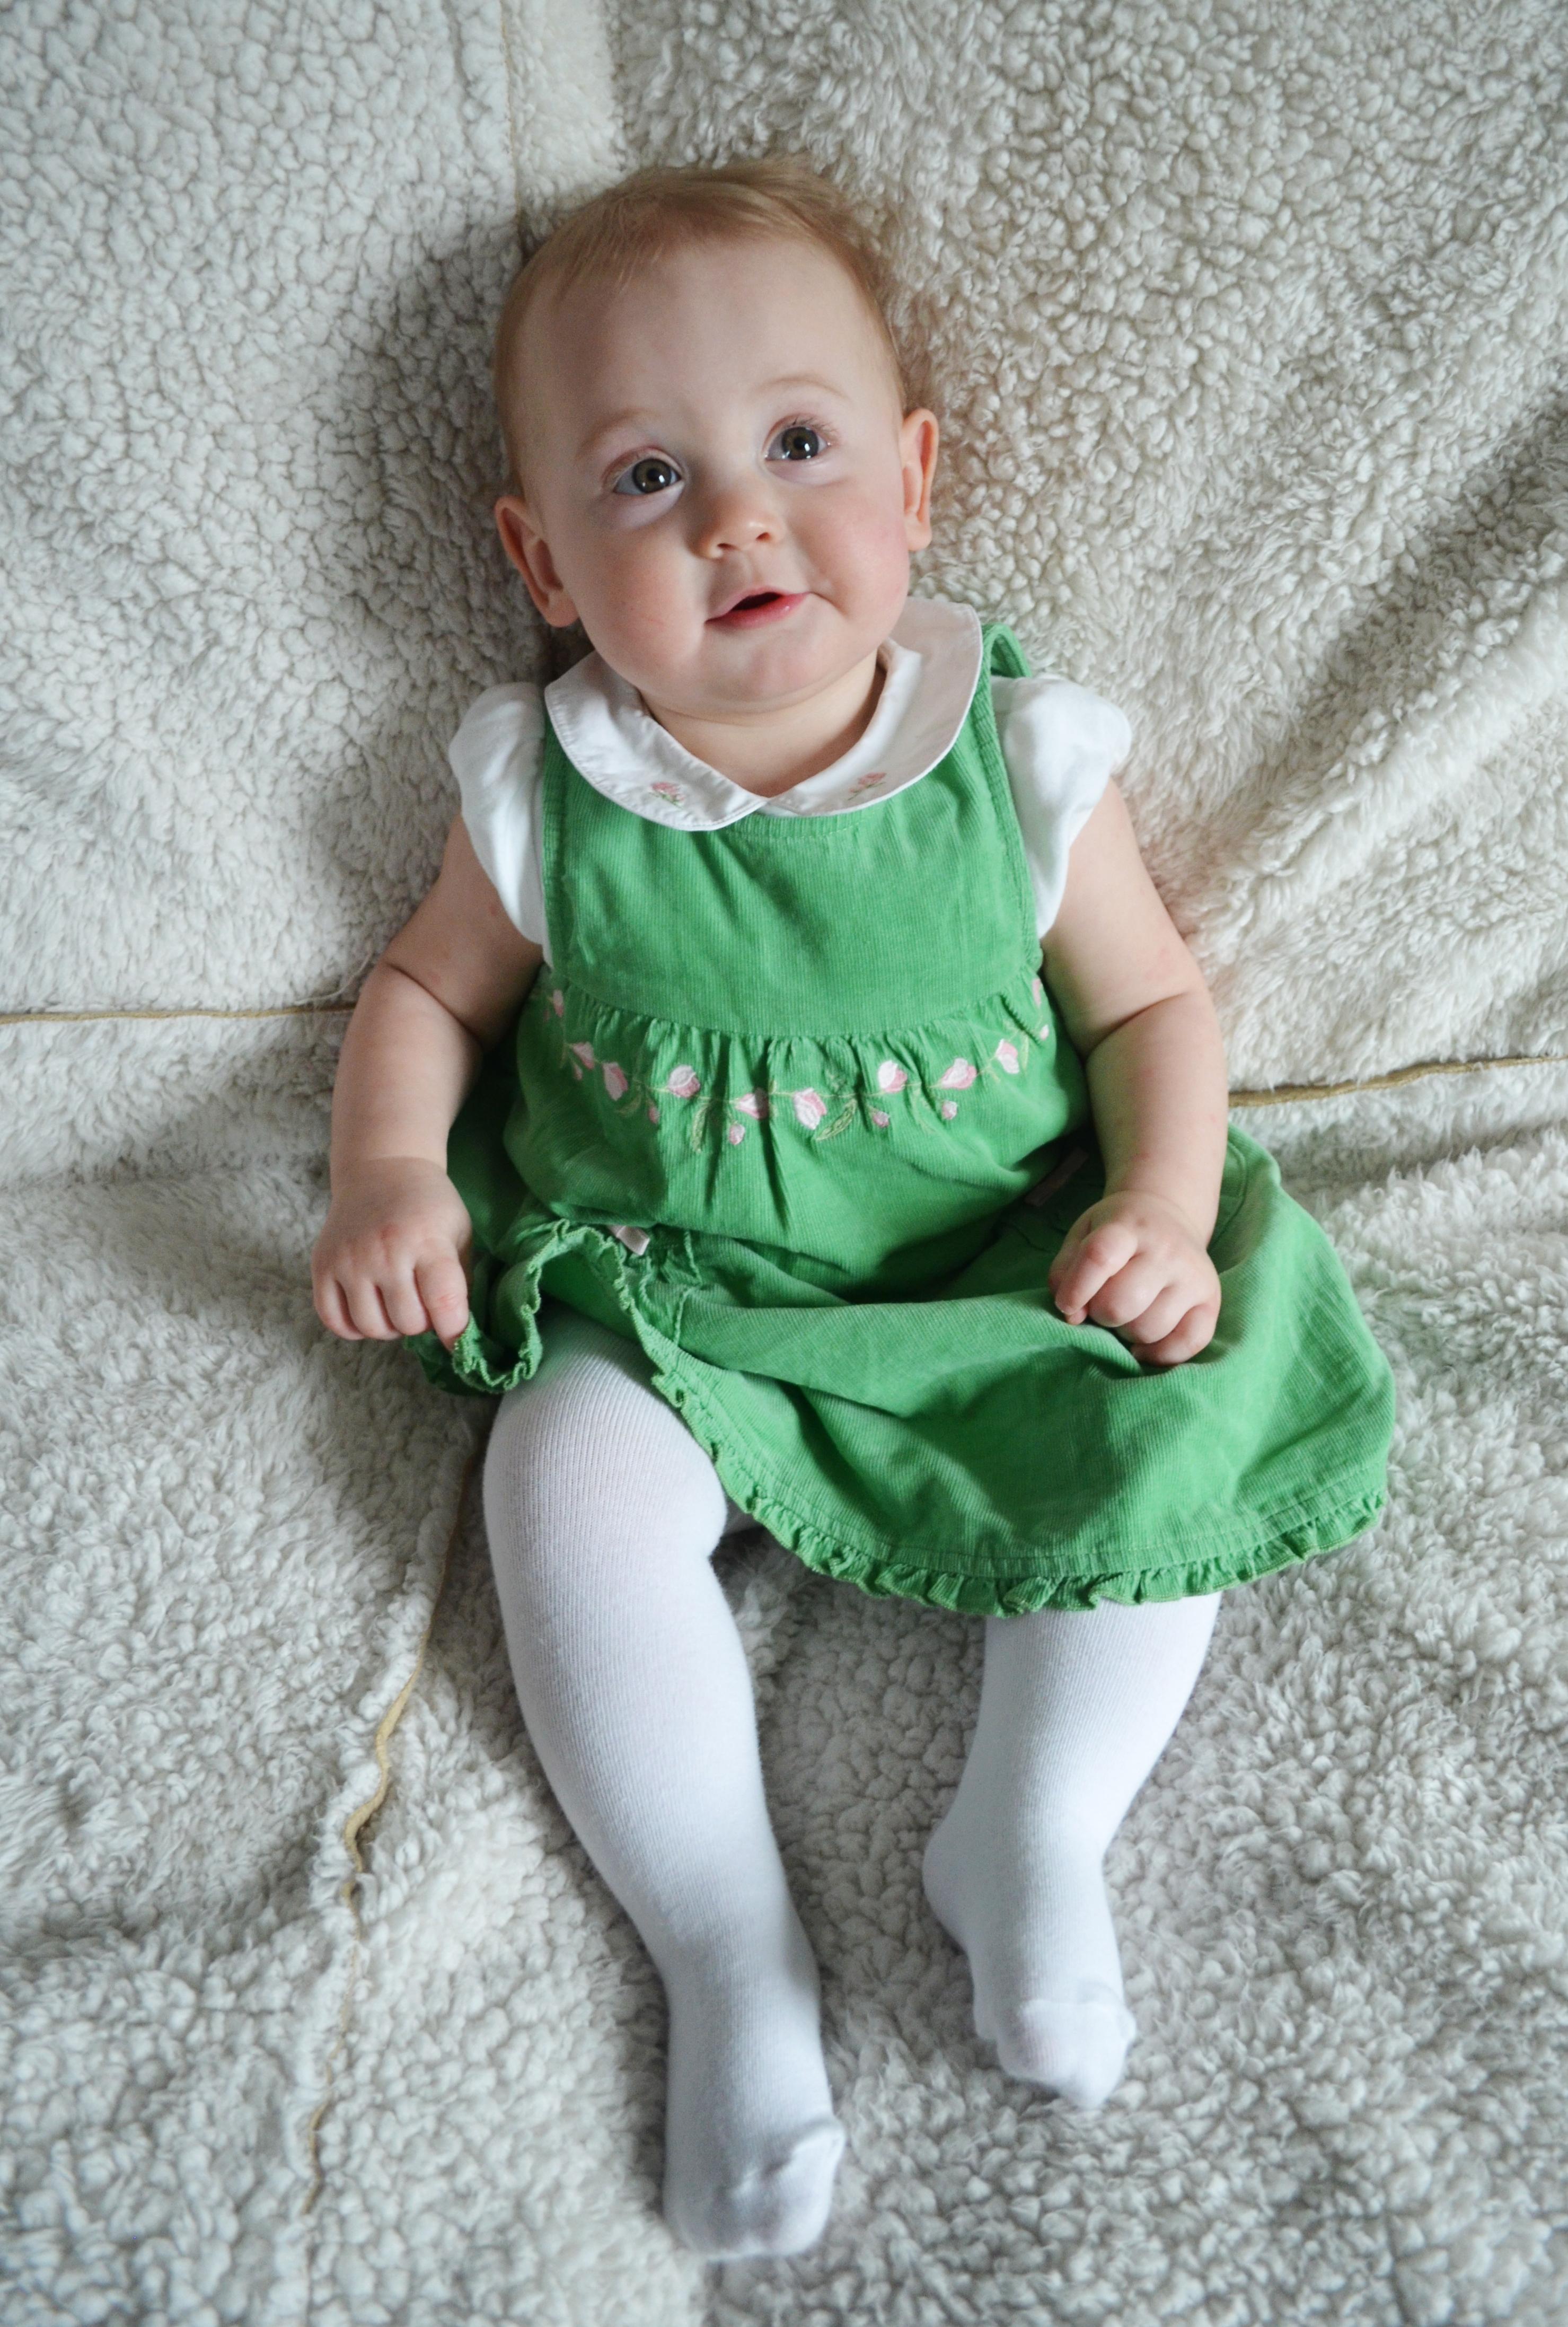 Isla at 11 months